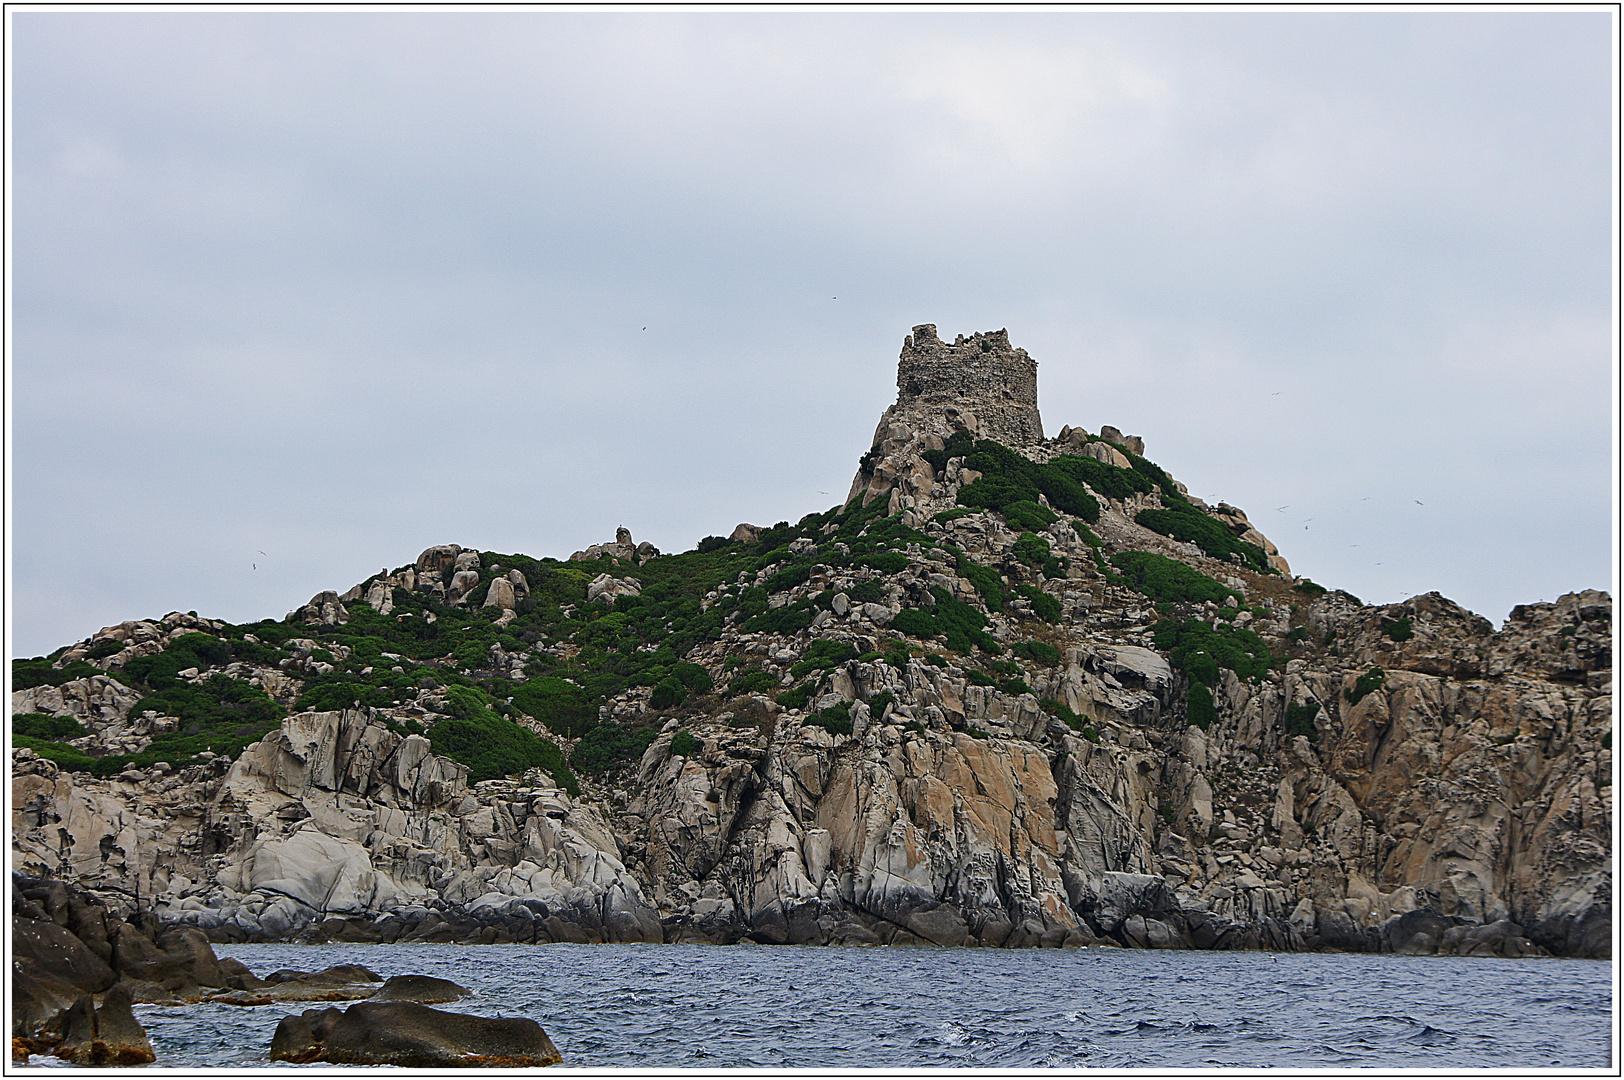 Costa Rei; Isola Serpentara